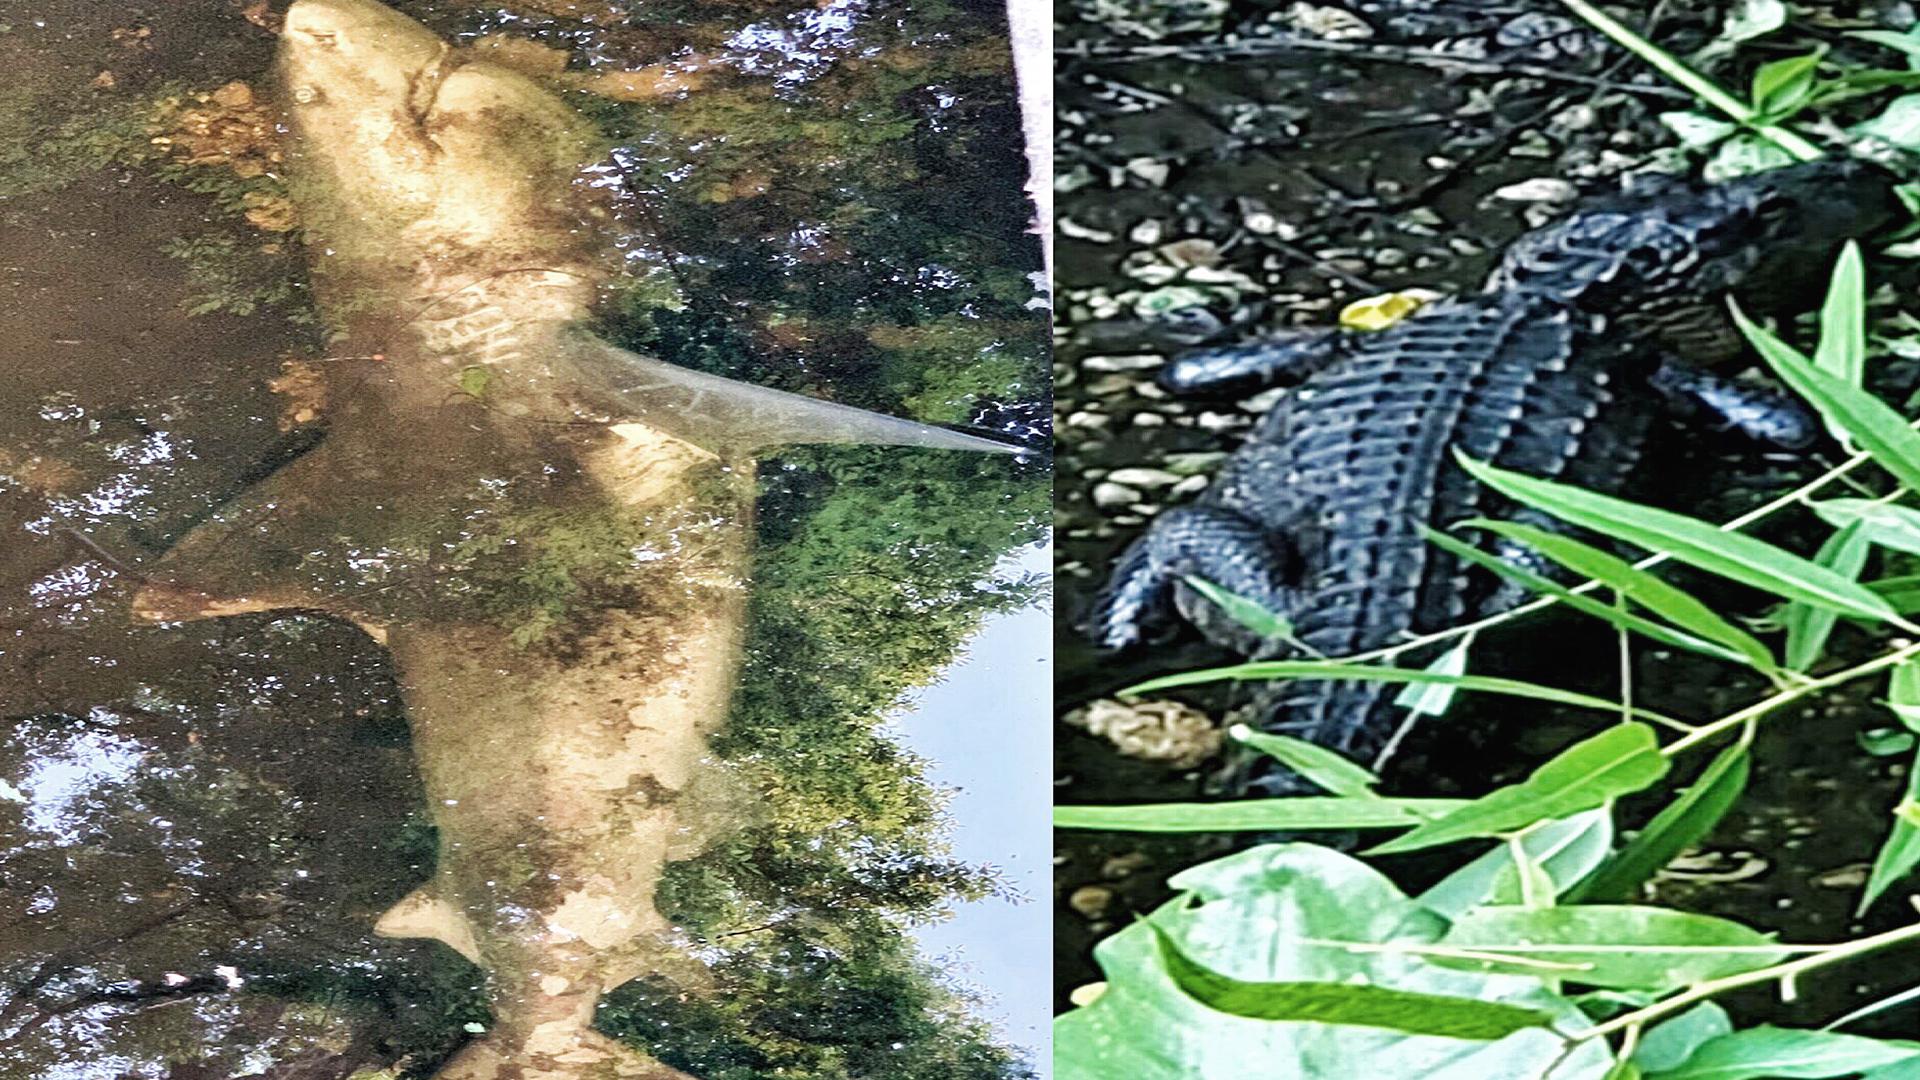 Shark found in Gator filled creek_1558436437567.jpg.jpg